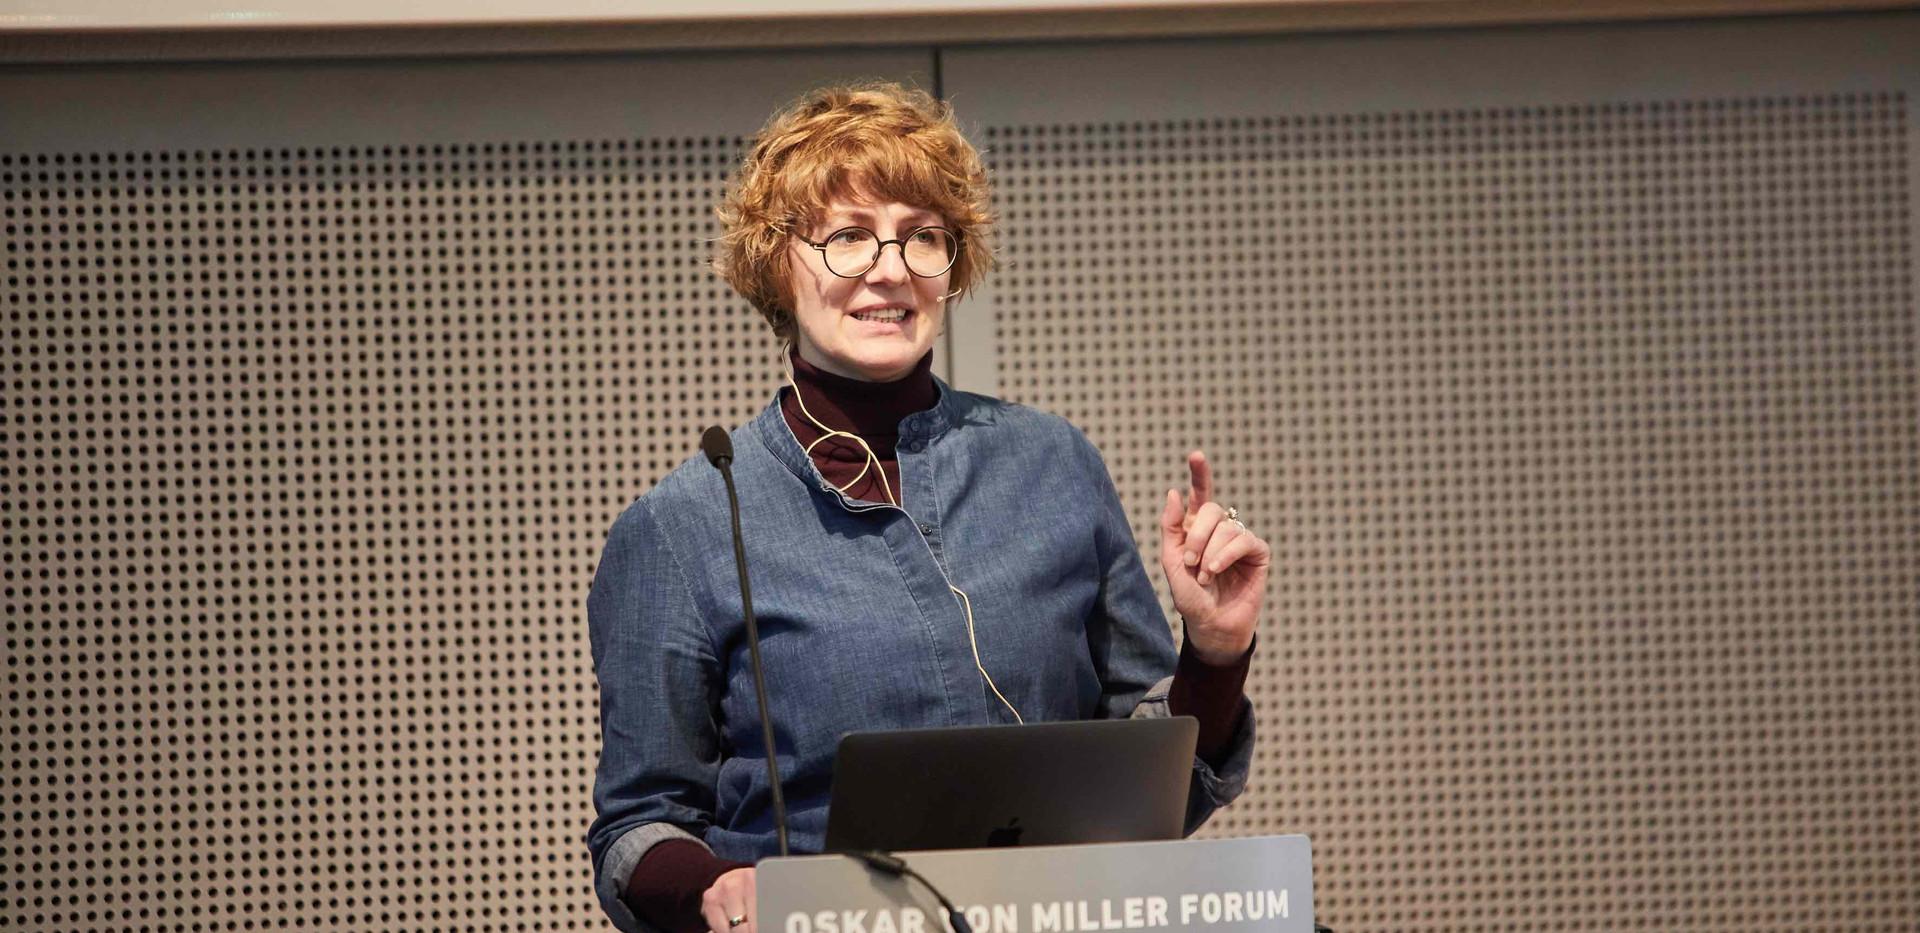 Prof. Daniela Hensel, Professorin im Studiengang Kommunikationsdesign HTW Berlin